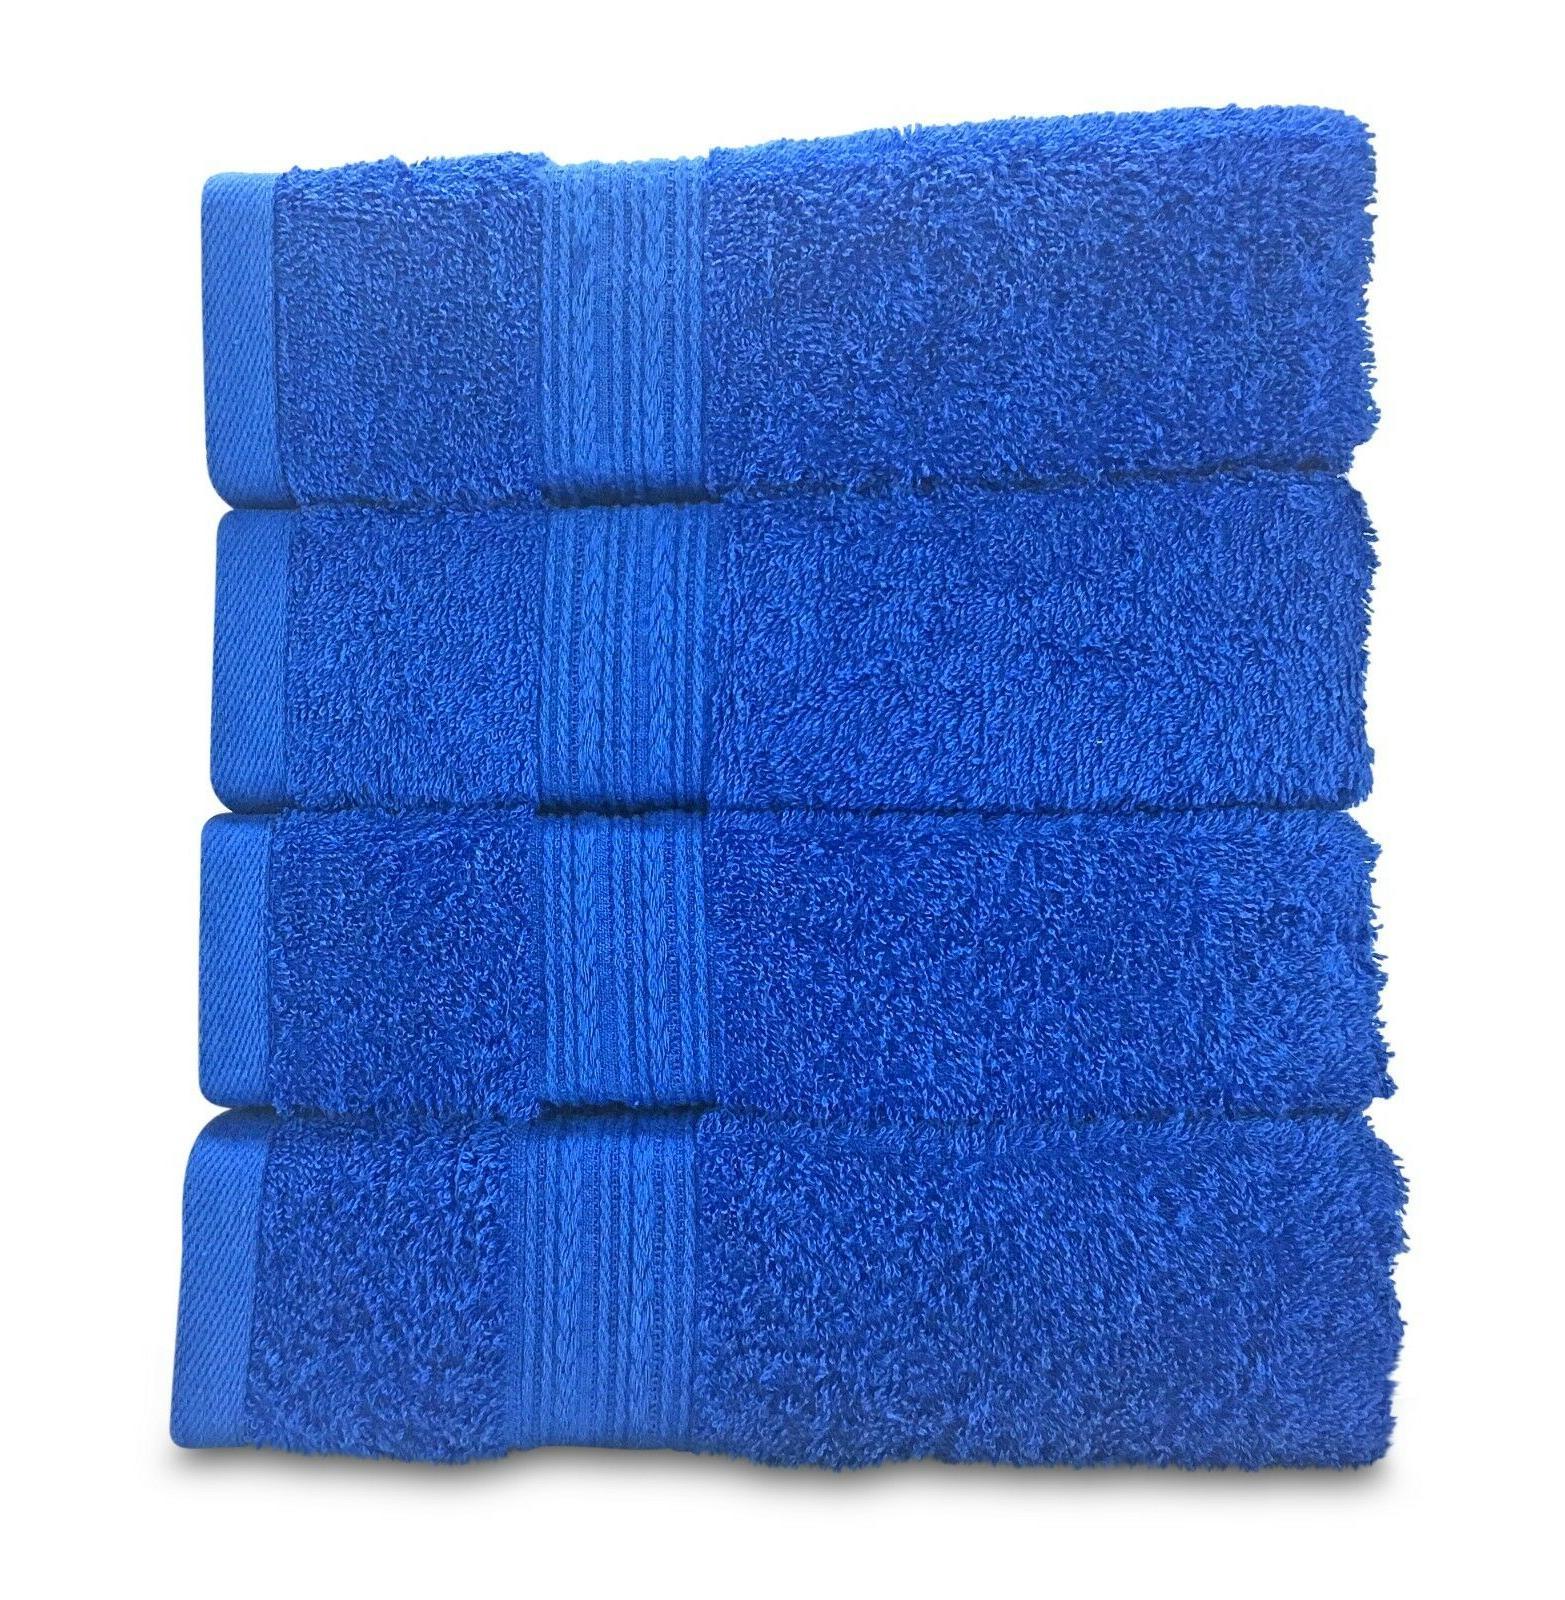 Goza Hand Bath, Home, Gym, Towels 4